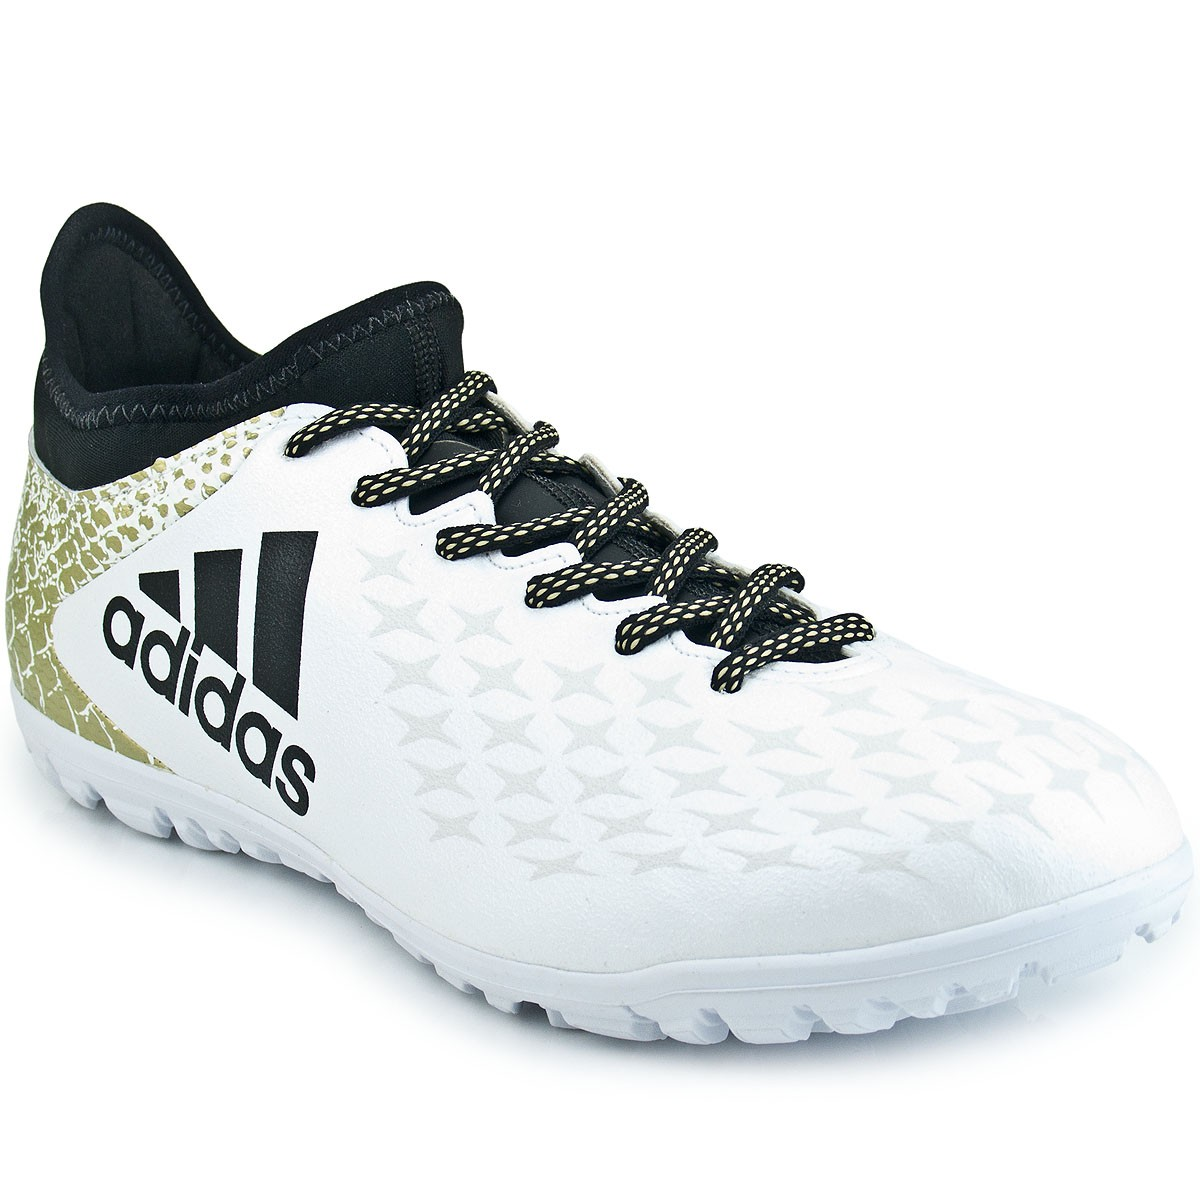 Chuteira Adidas X 16.3 TF  bc2221fd58c7c